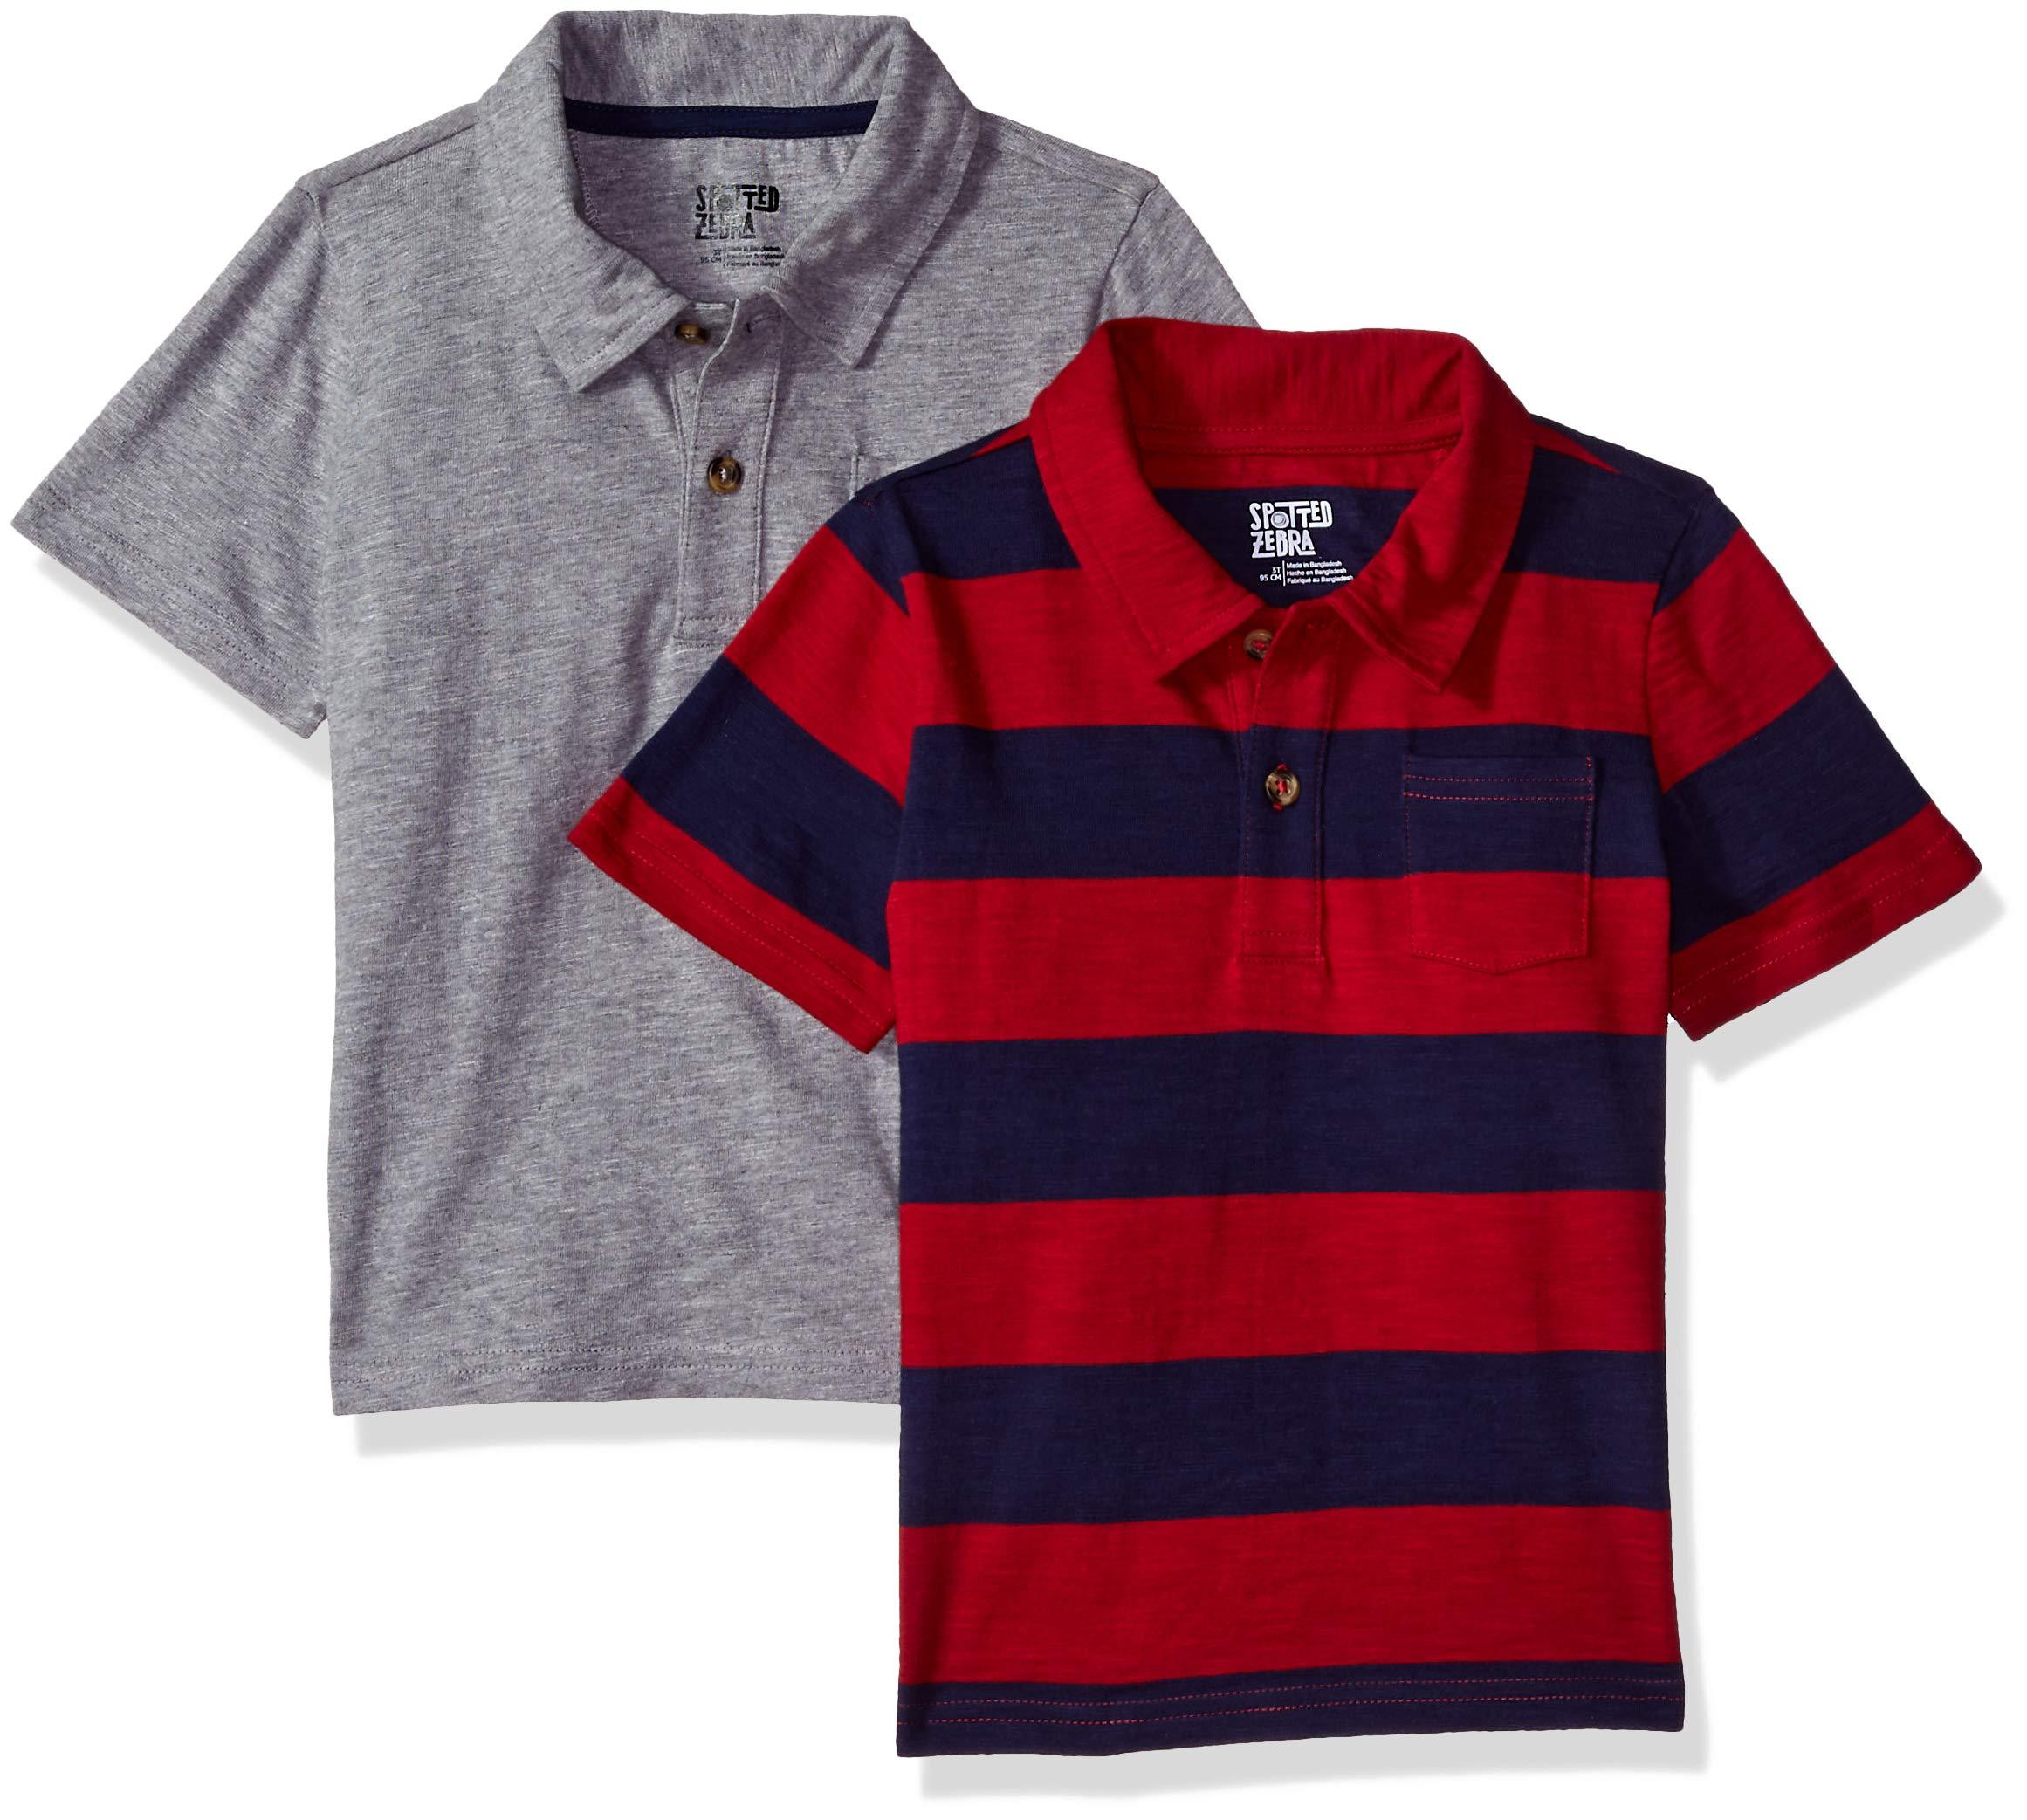 Spotted Zebra Boys' Big Kid 2-Pack Slub Jersey Short-Sleeve Polo Shirts, Red/Blue Stripe, Medium (8)